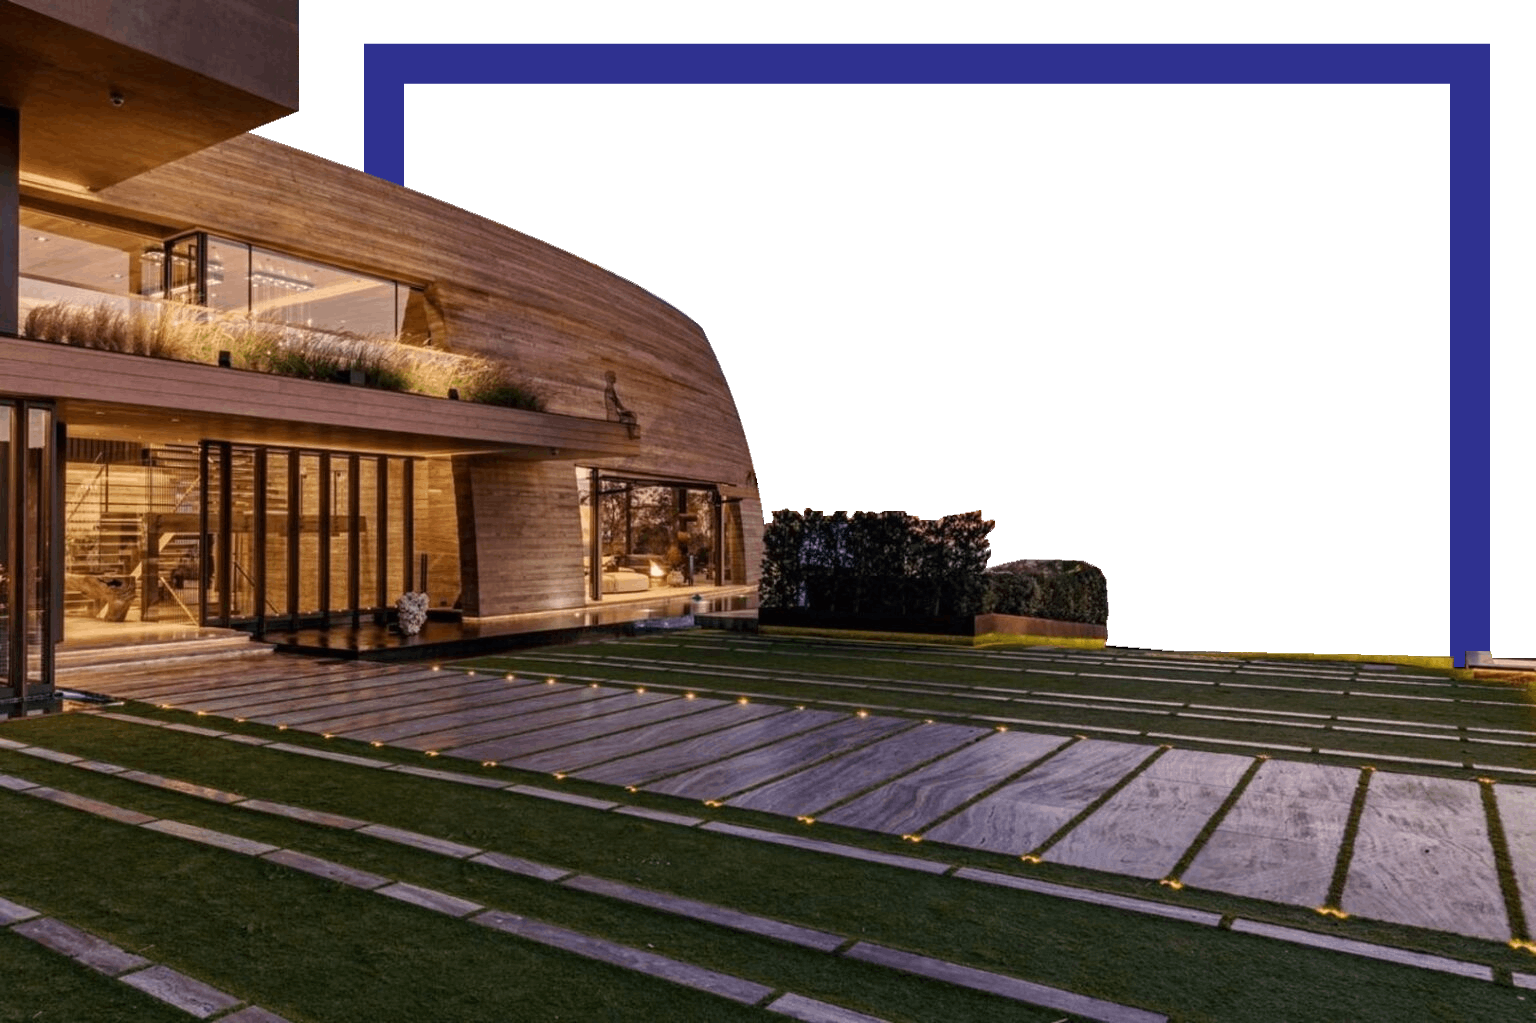 House sunset square background